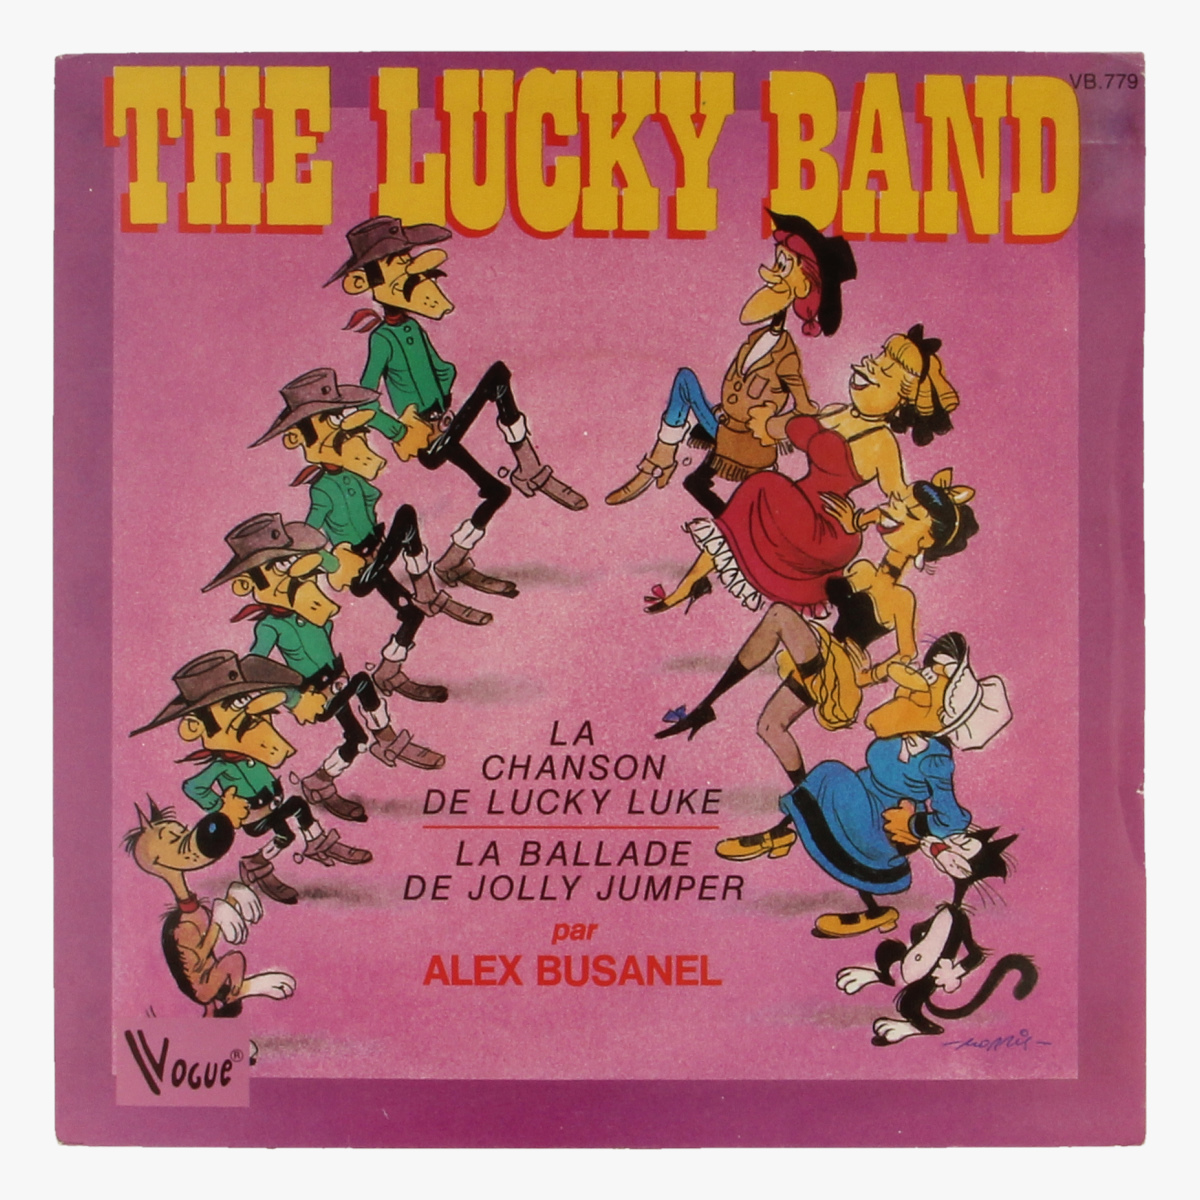 Afbeeldingen van The Lucky Band La chanson de lucky band. La ballade de jolly jumper LP 44 toeren